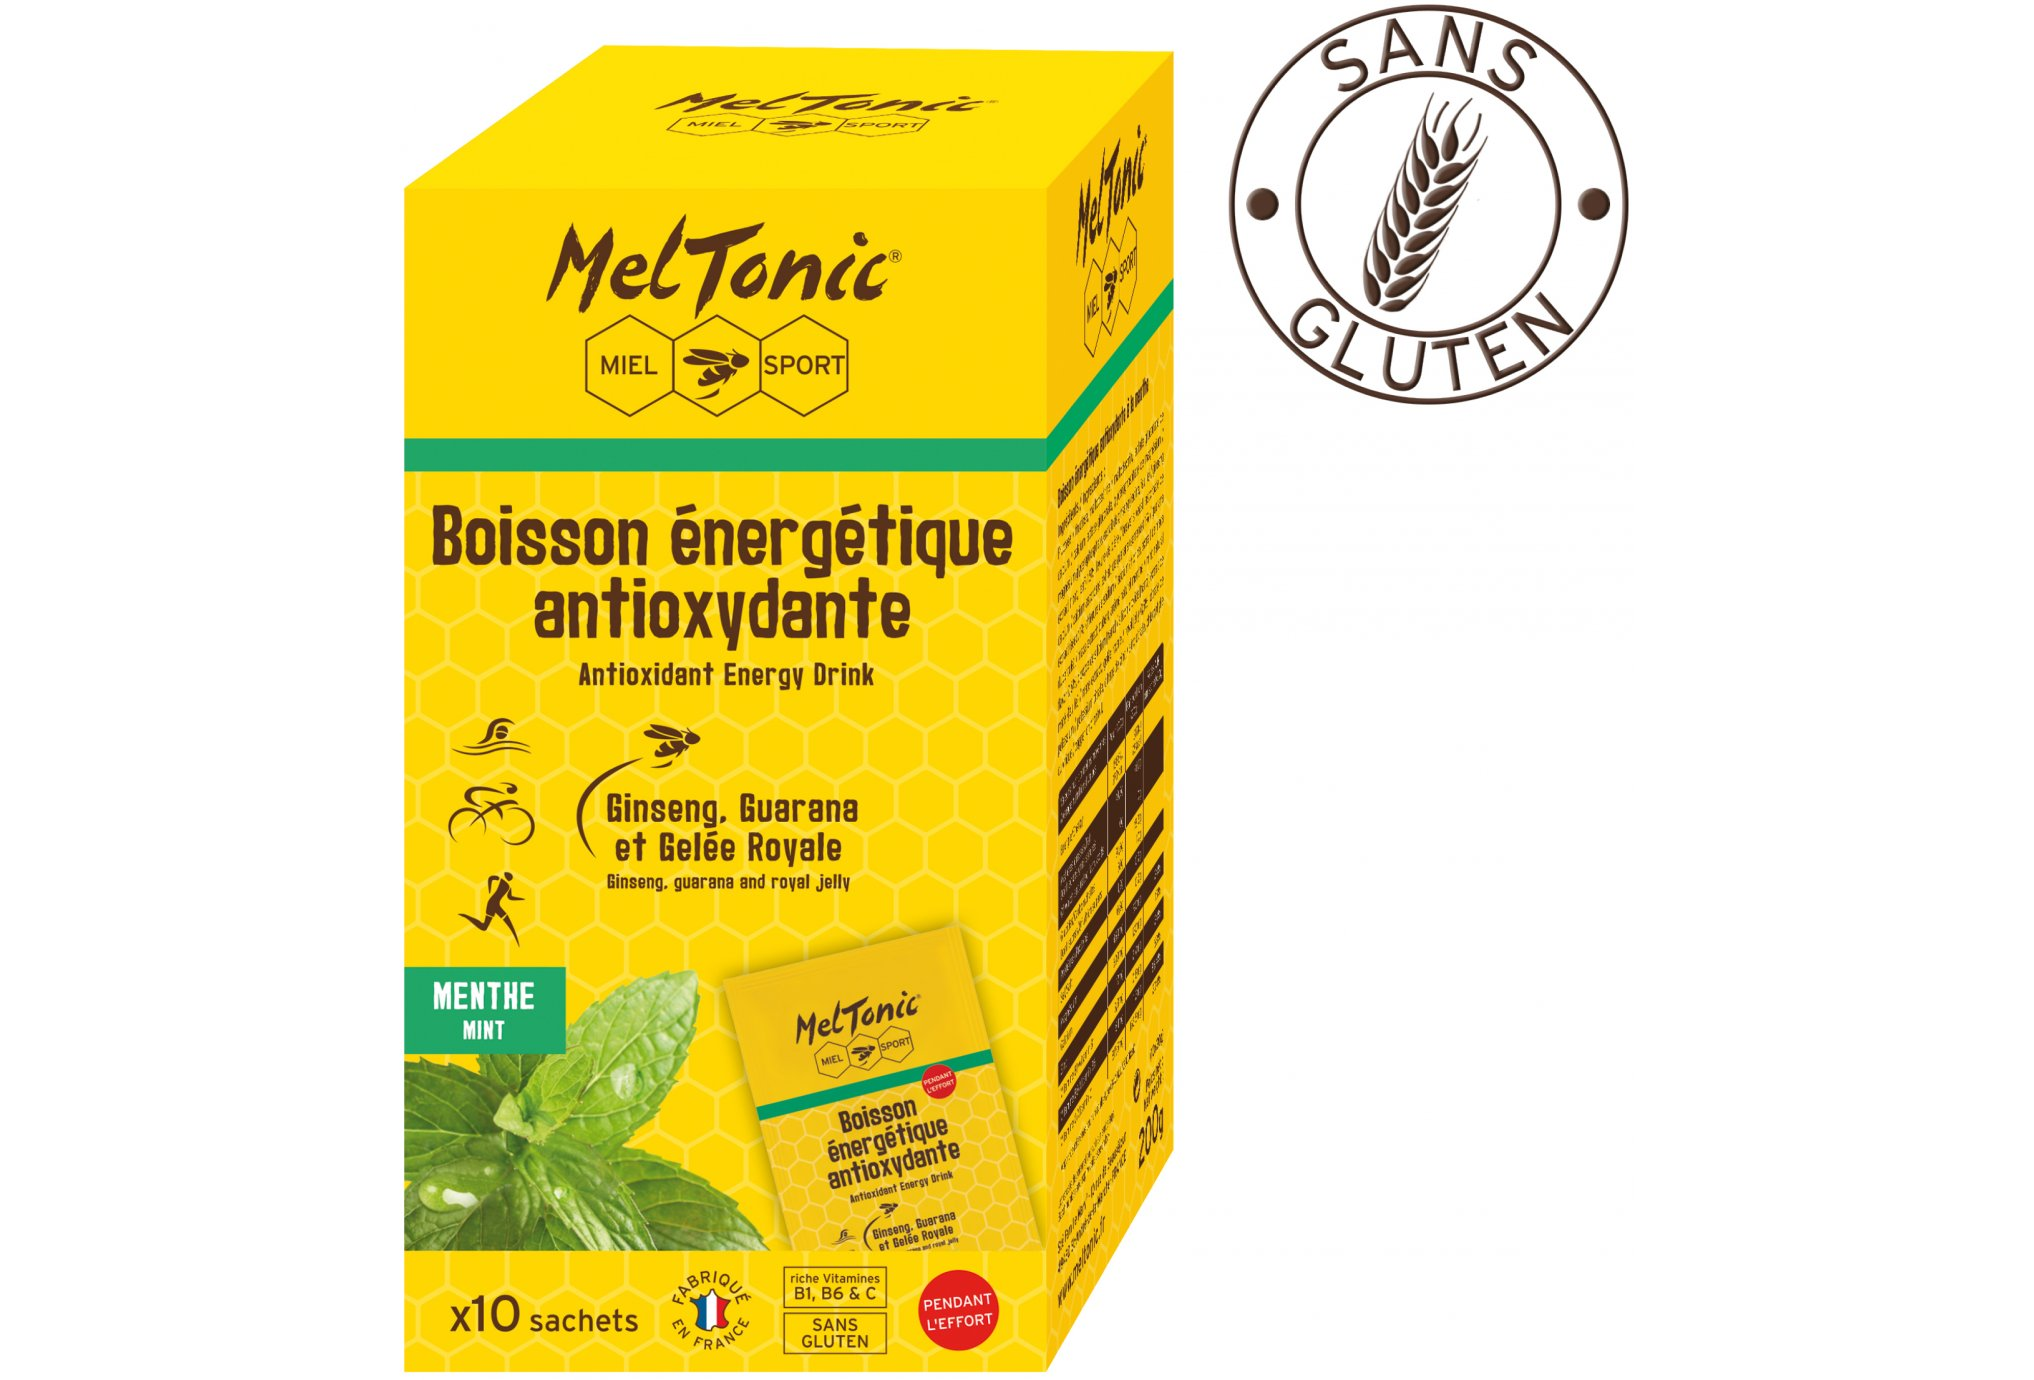 MelTonic Bebida Energética Antioxidante- Menta Diététique Boissons